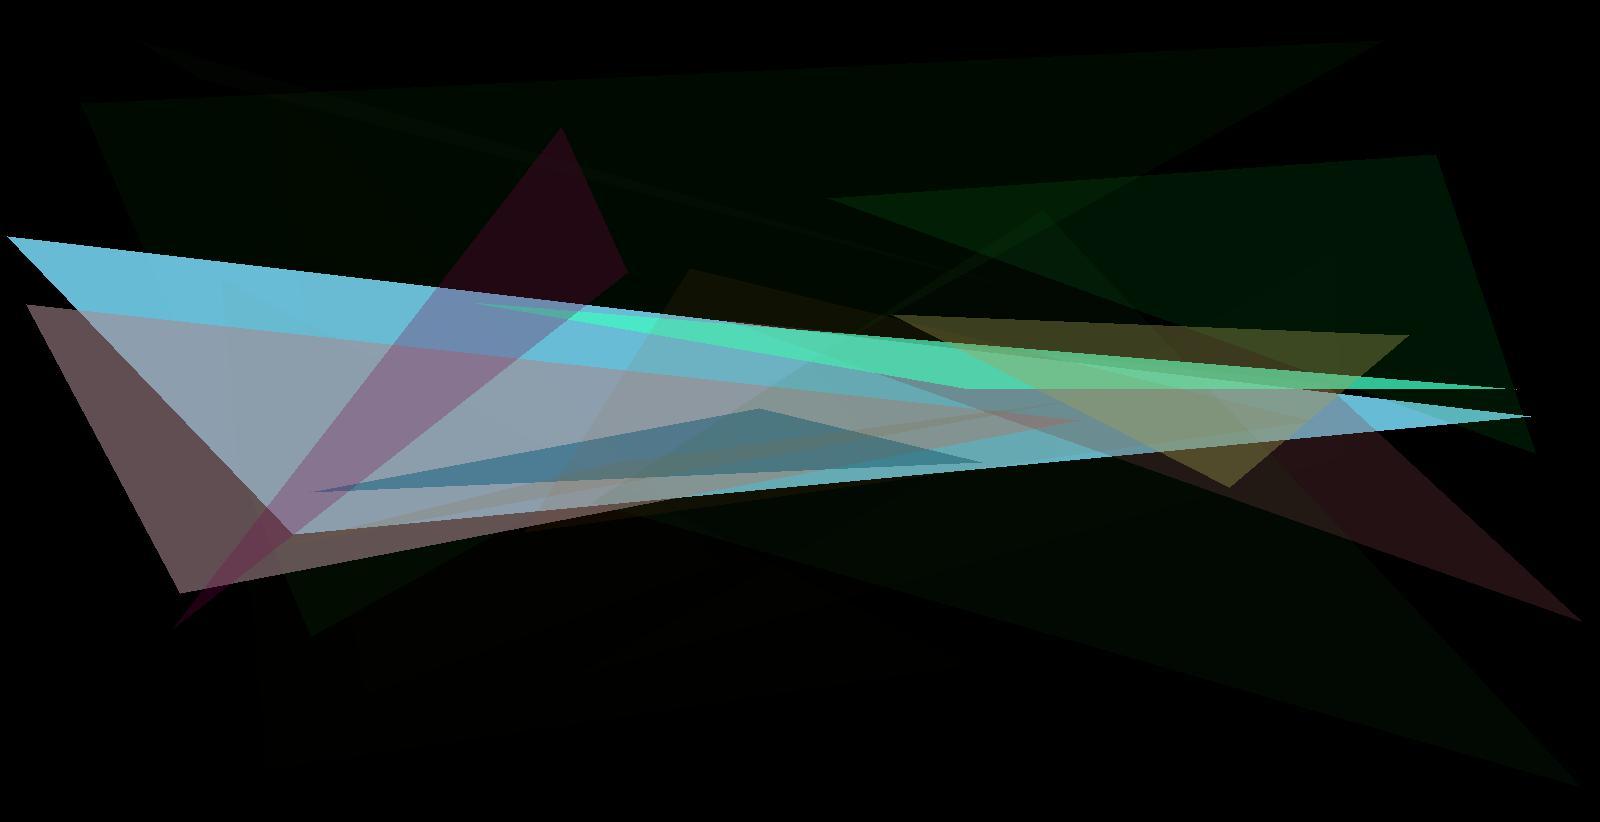 generation 448-91.386508_per_cent-17_brush_strokes.jpg